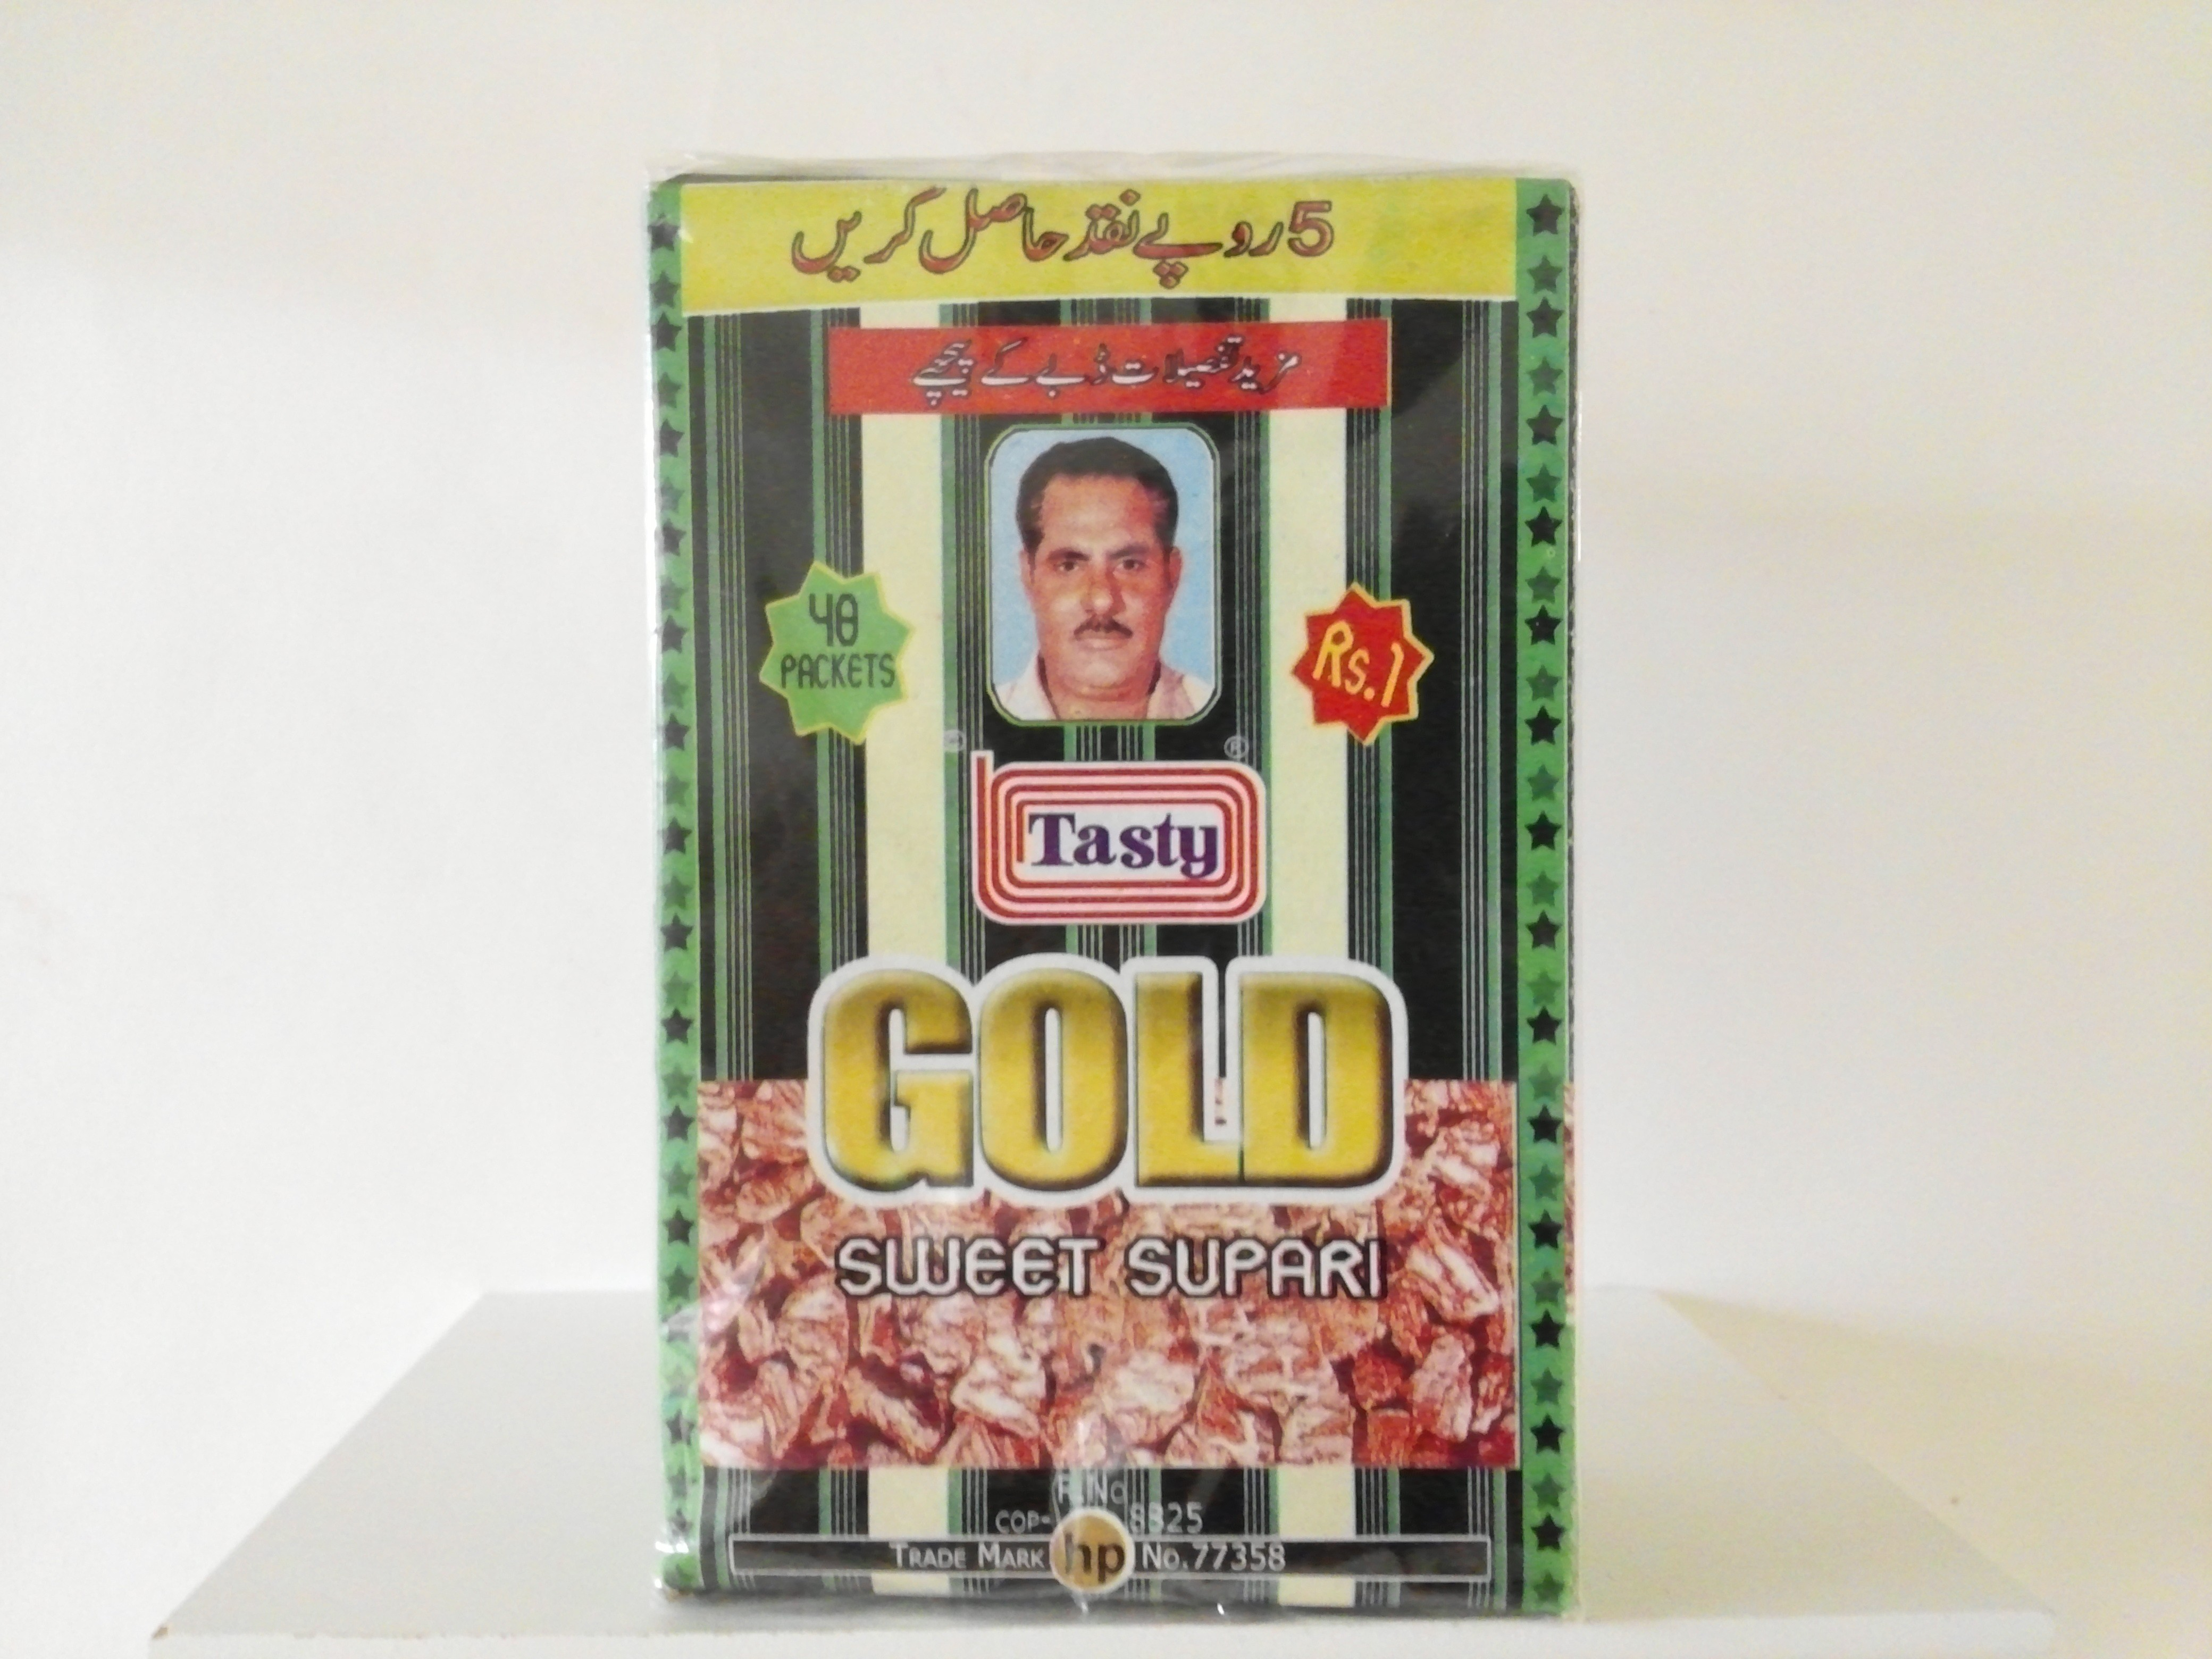 Tasty Gold Sweet Supari 48 Pack